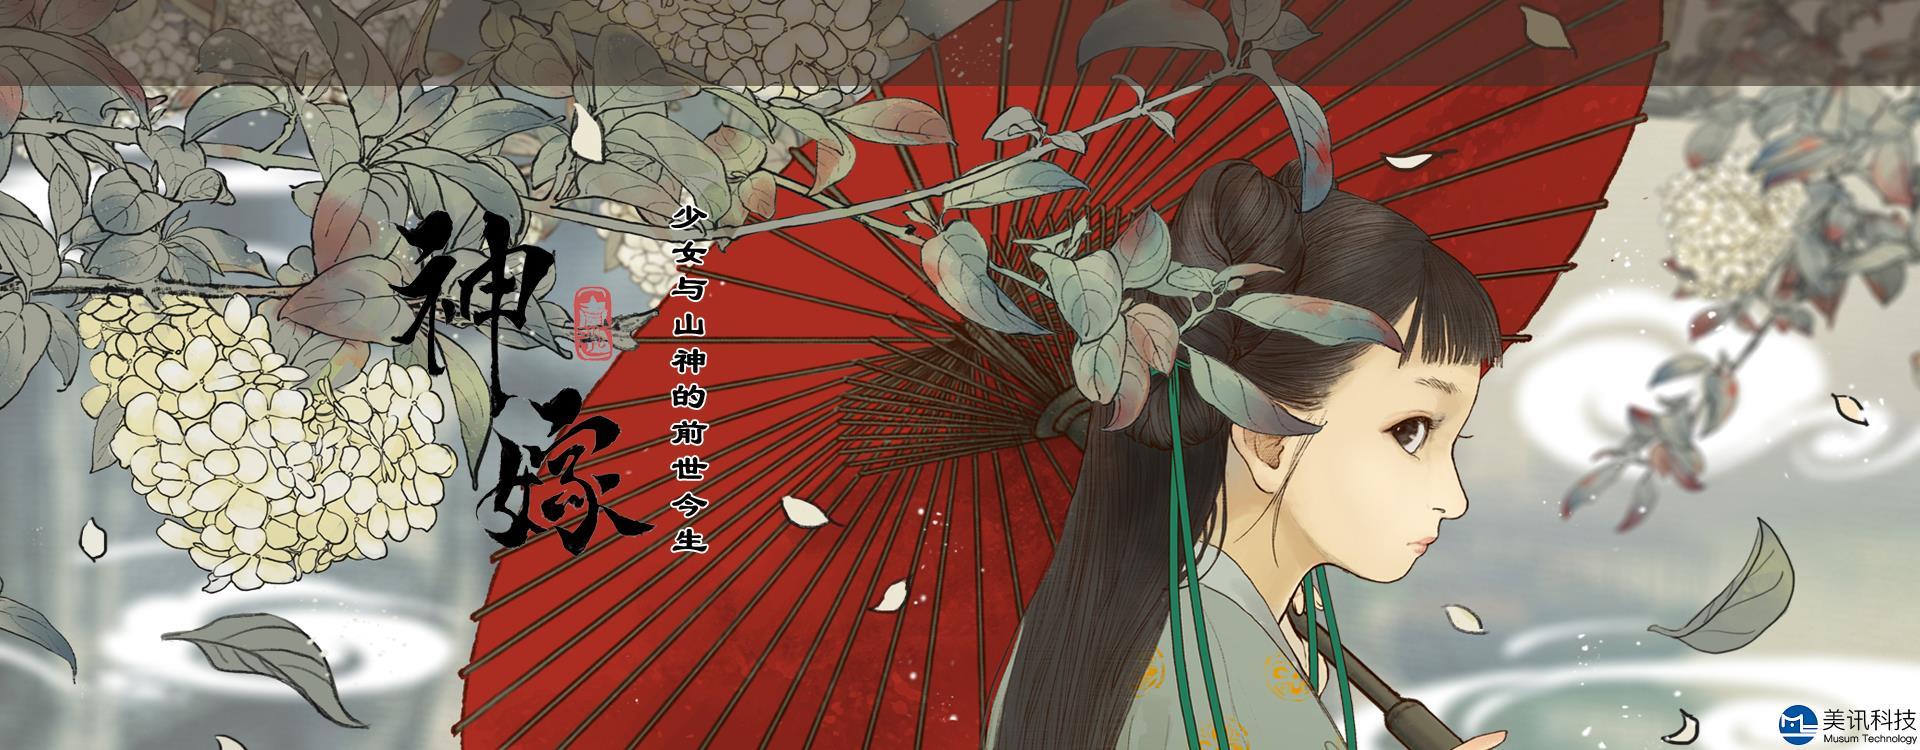 南辰北斗banner1